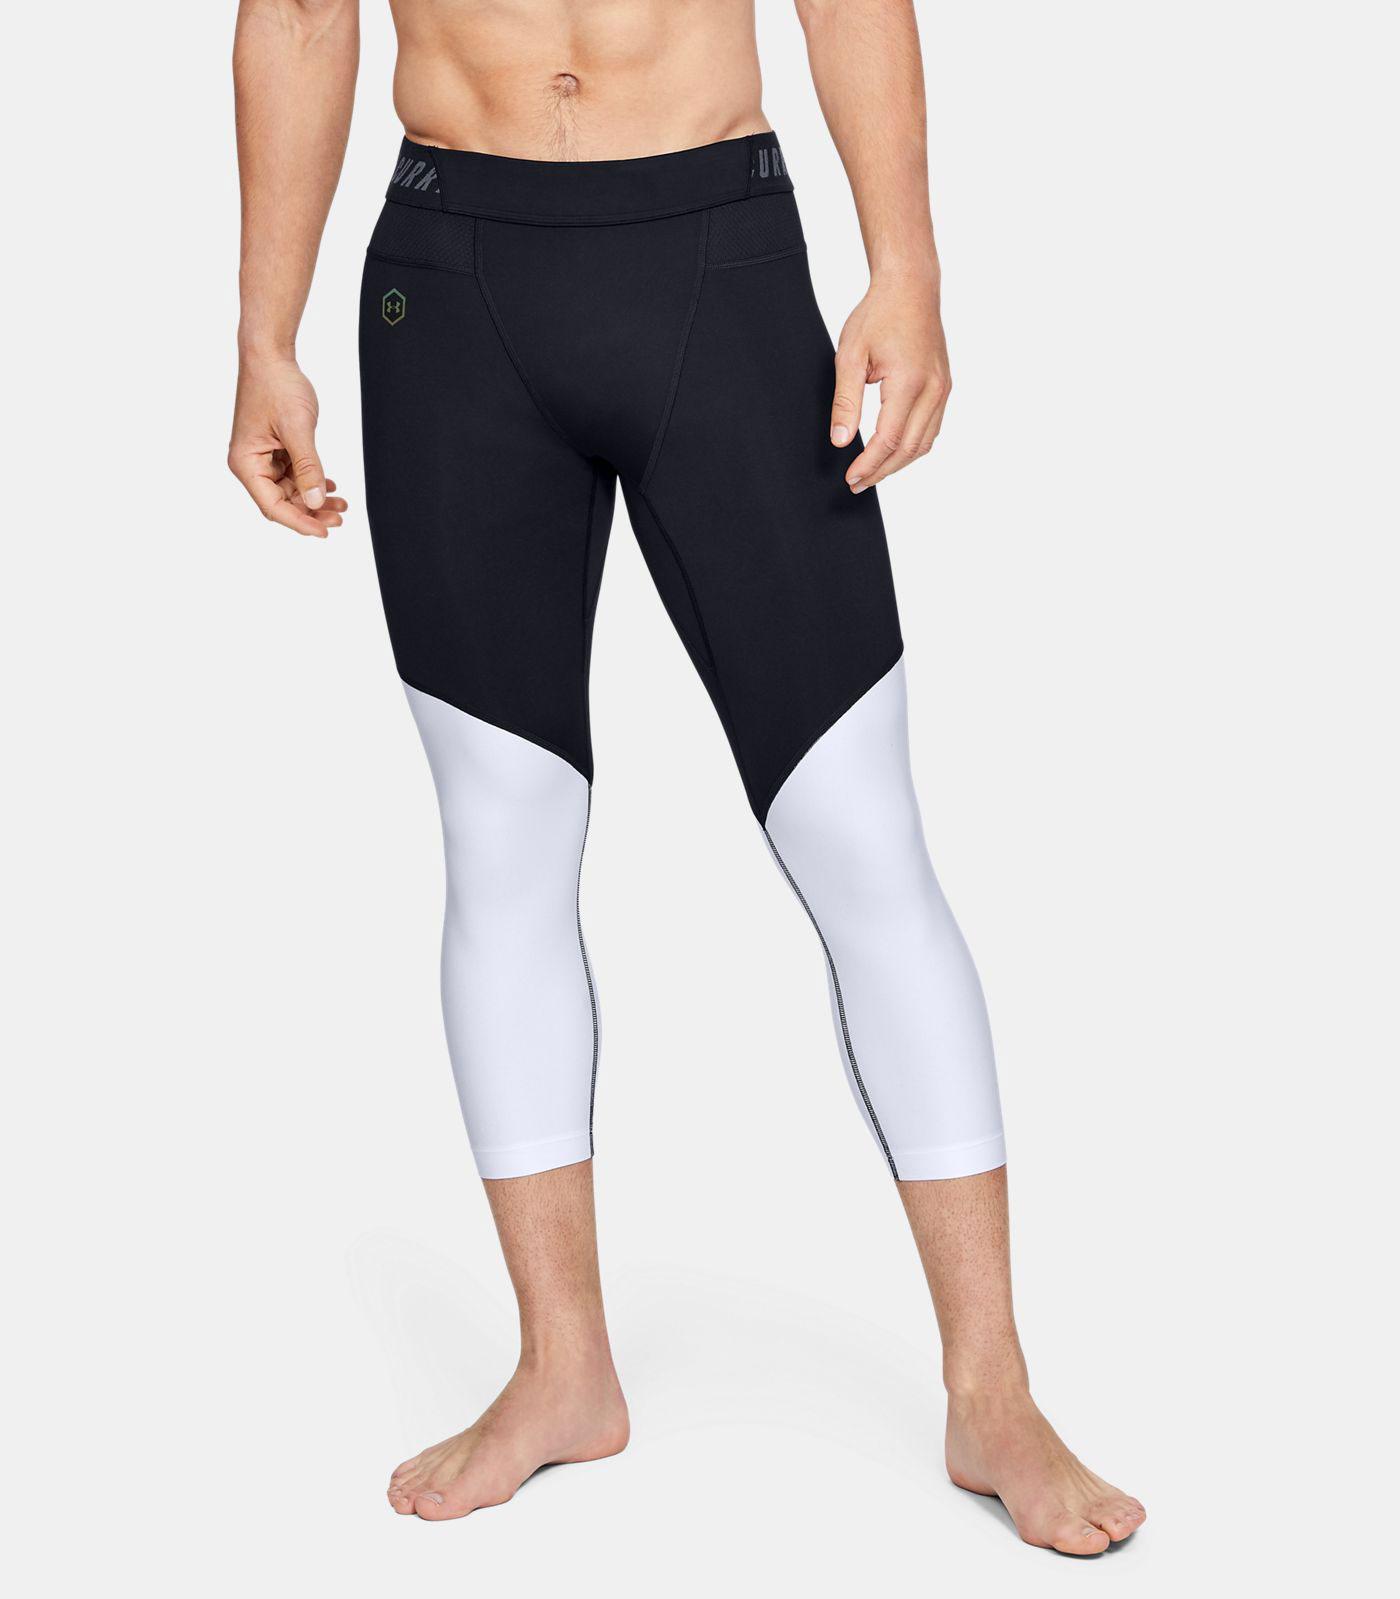 curry-7-basketball-leggings-black-white